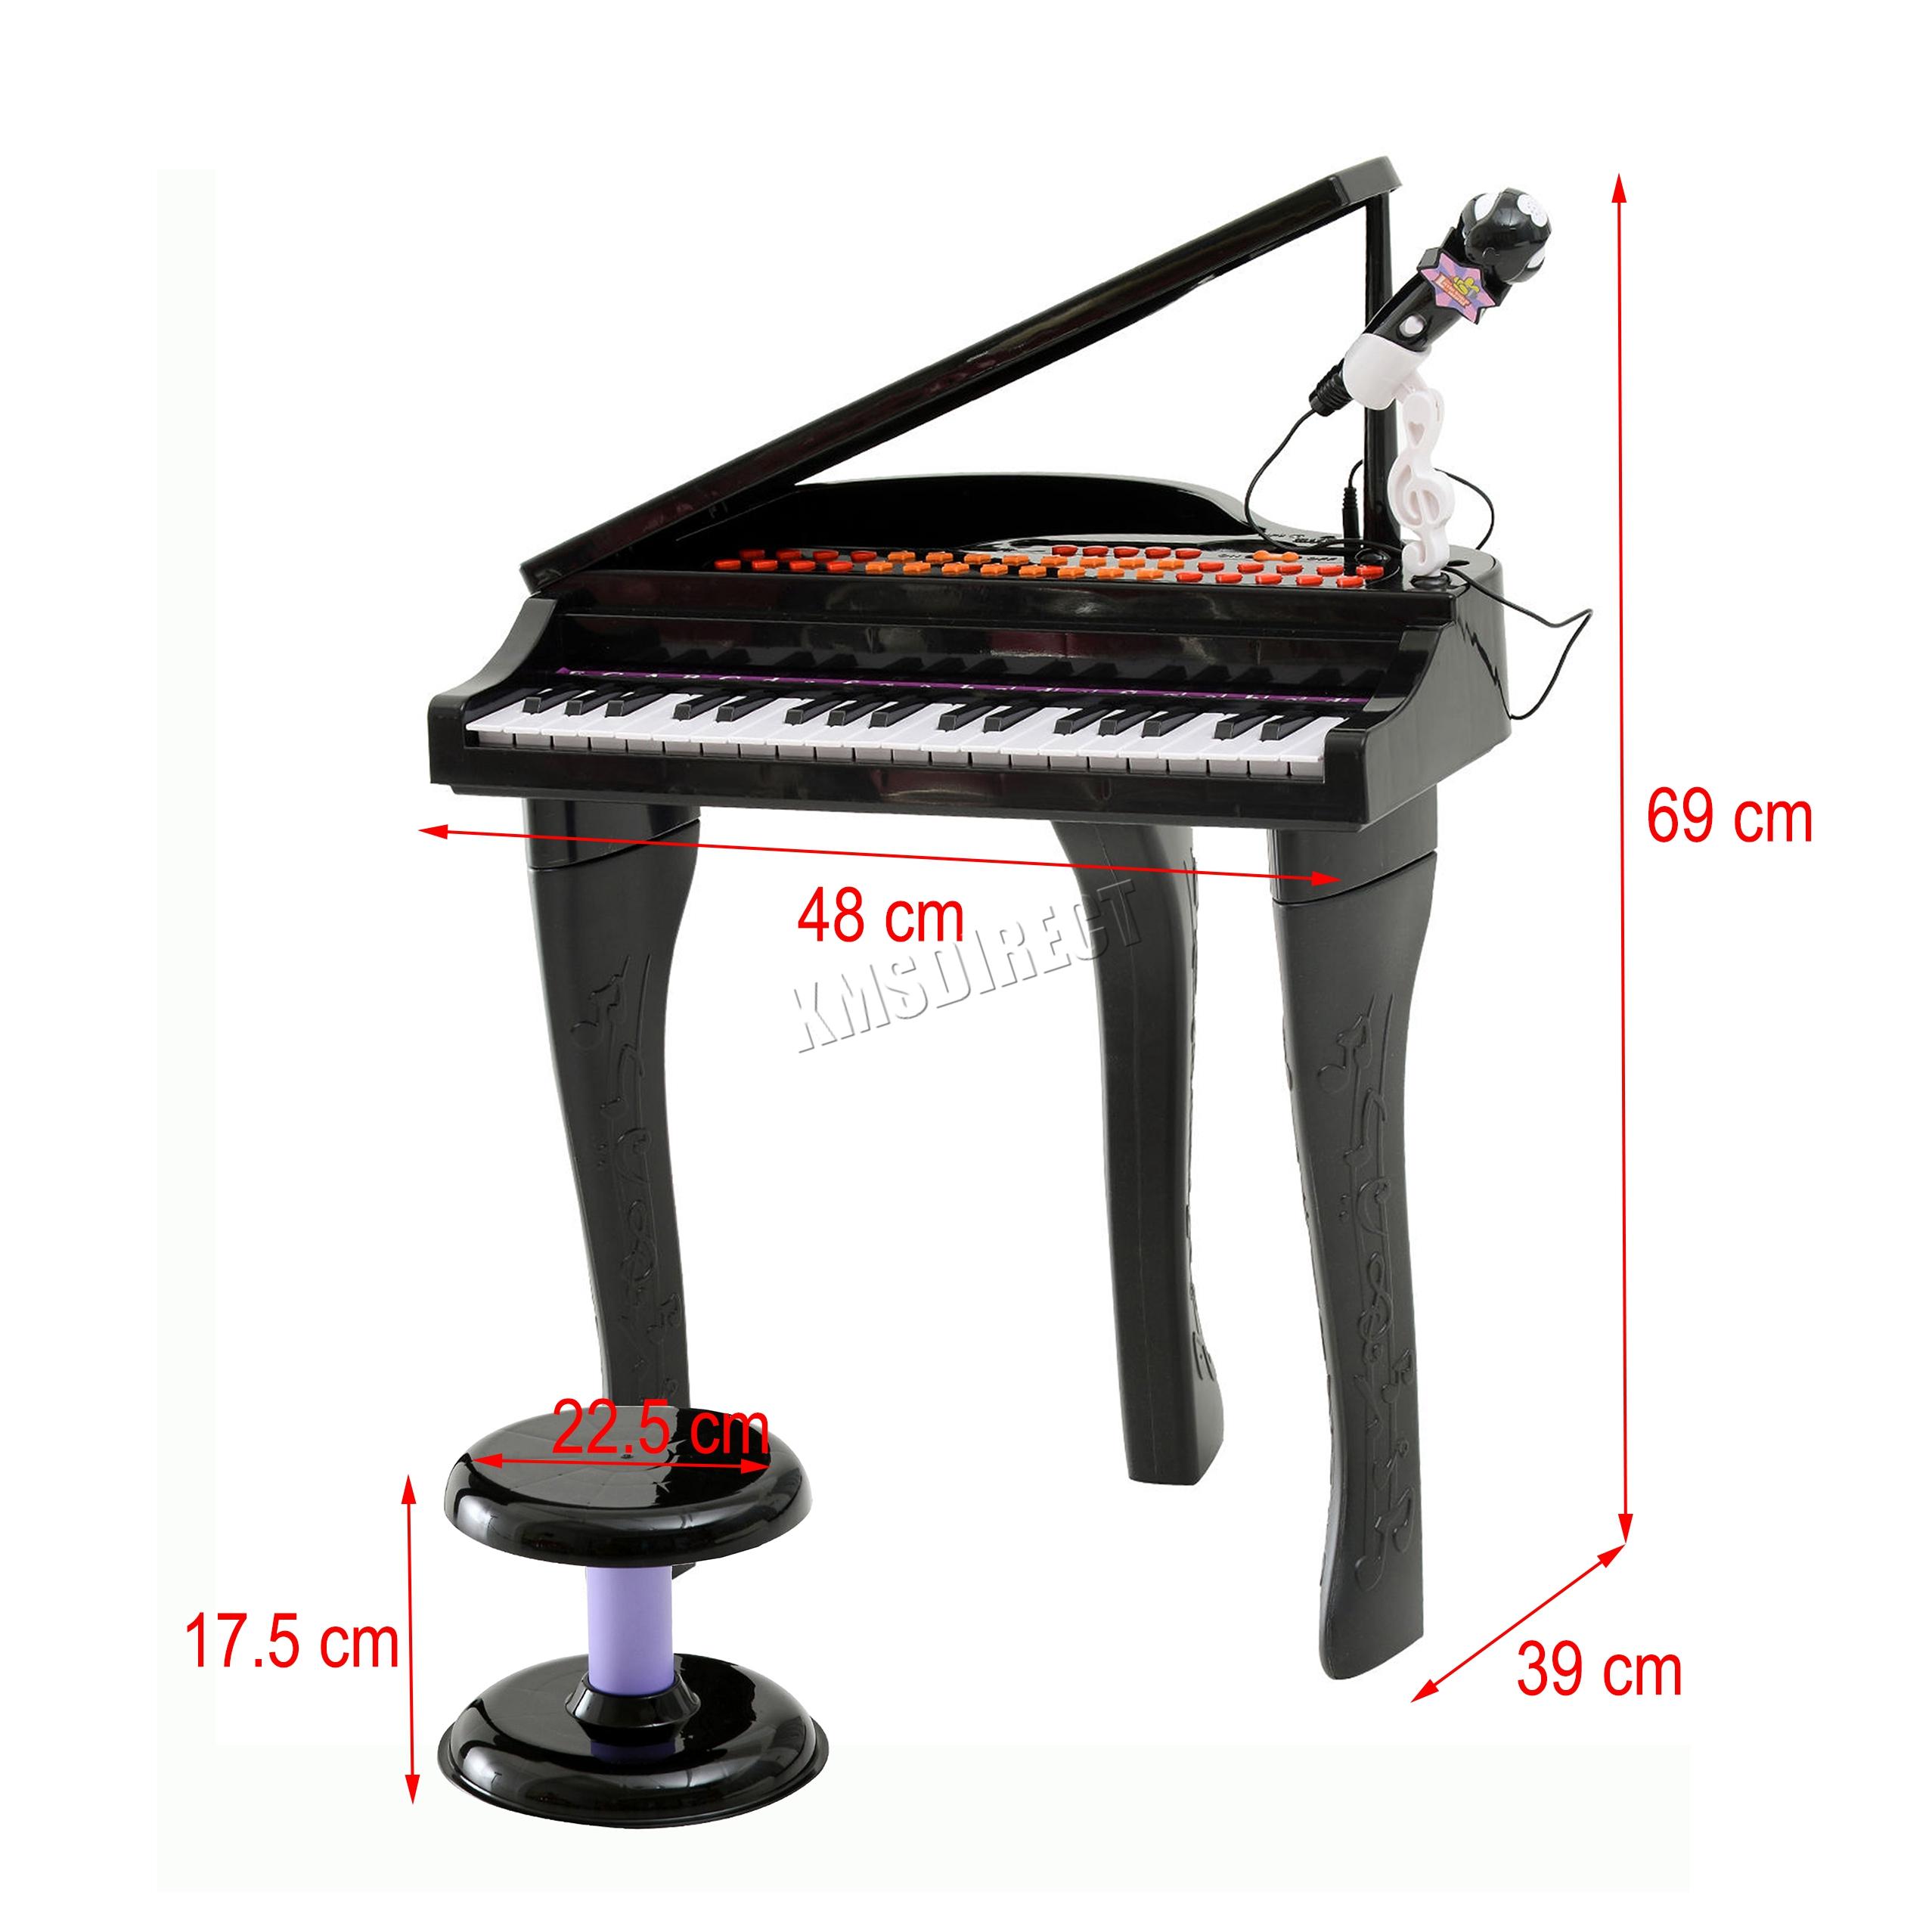 Foxhunter 37 Keys Kids Electronic Keyboard Piano